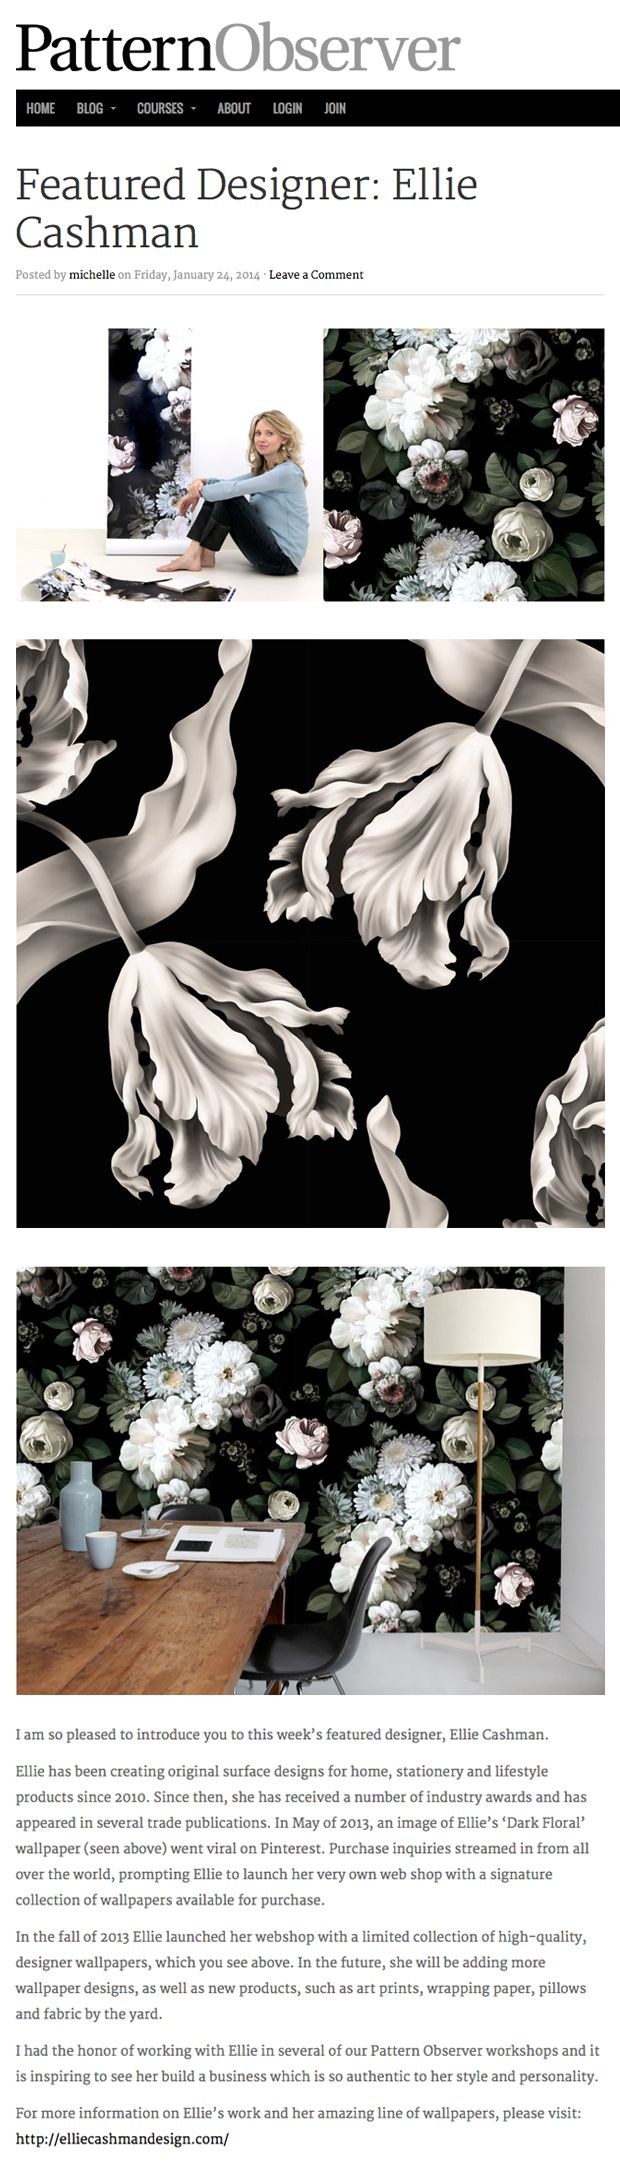 Black floral print wallpaper dark floral wallpaper by ellie cashman - Ellie Cashman Featured Designer At Pattern Observer